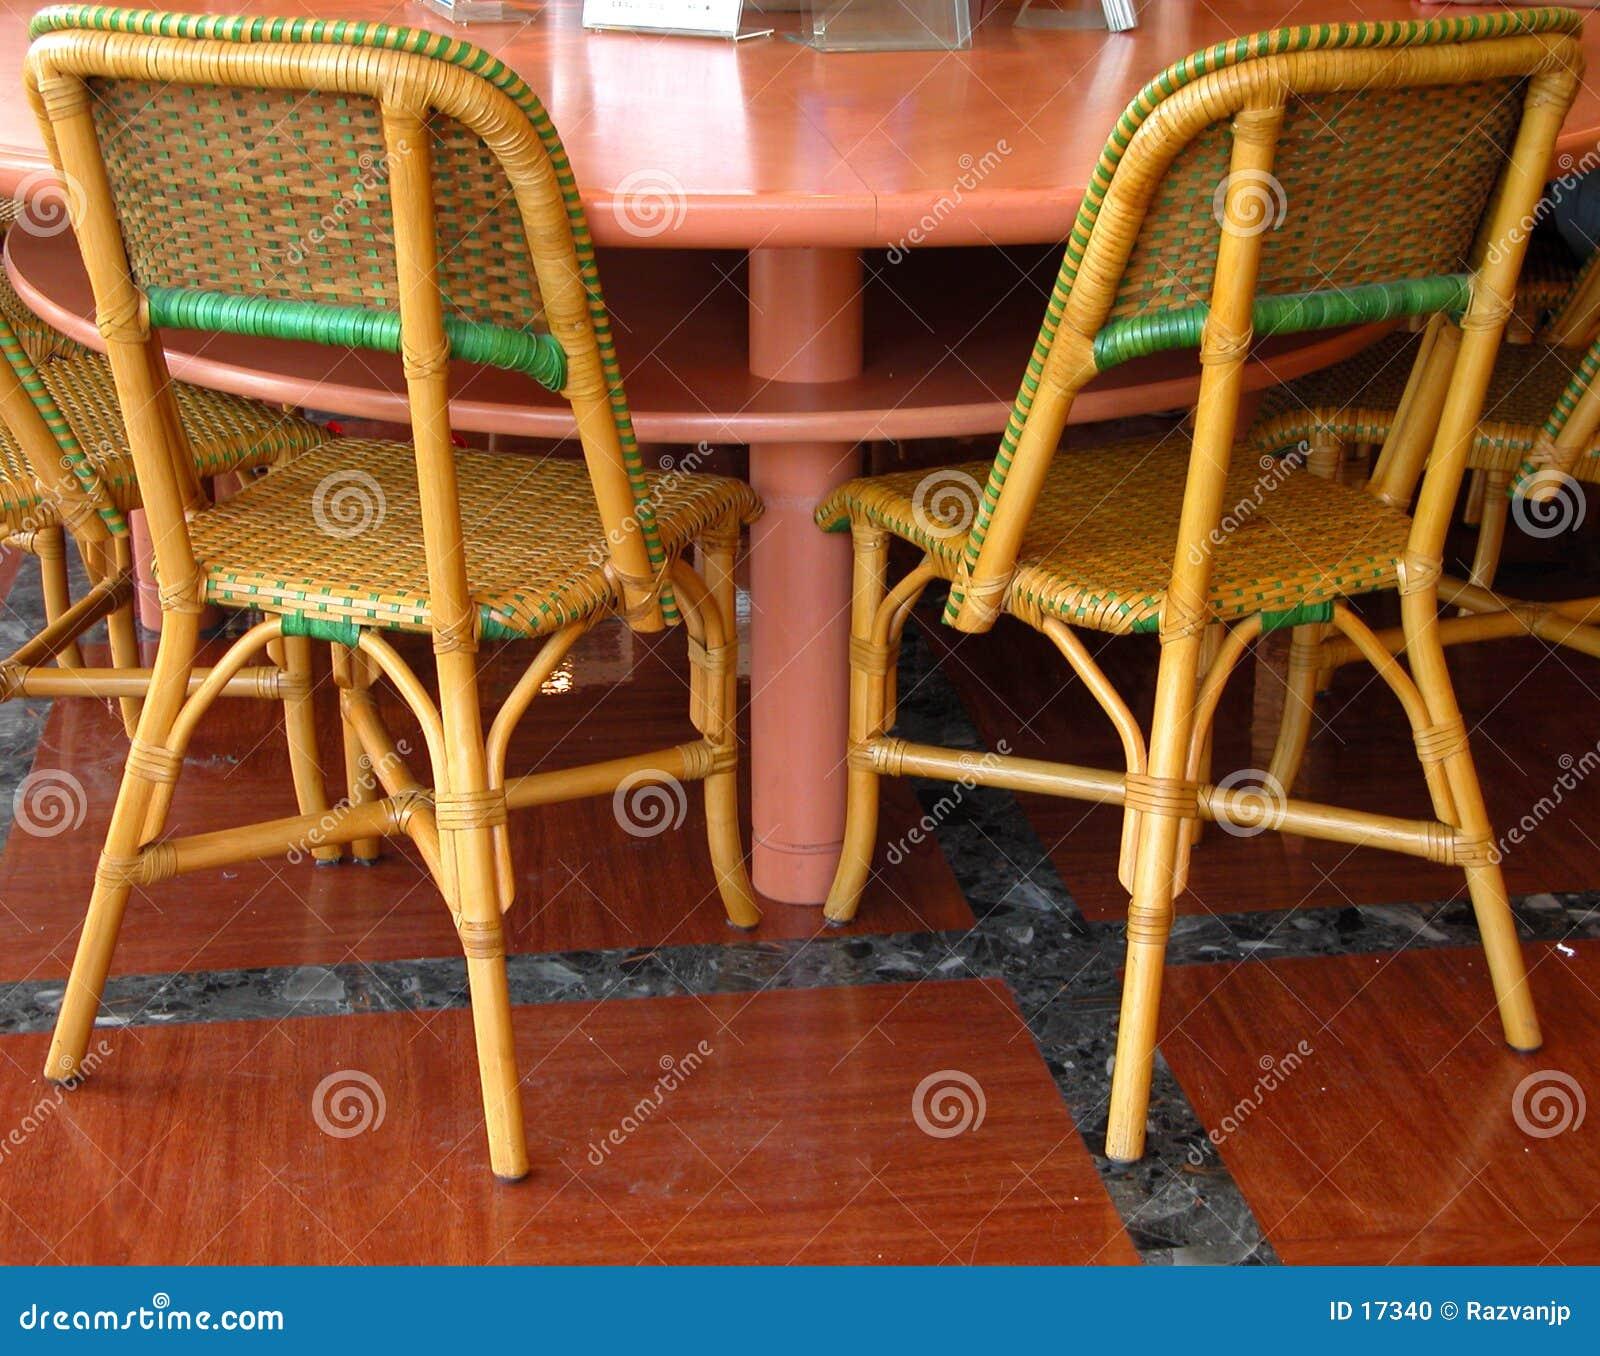 Inside coffee bar